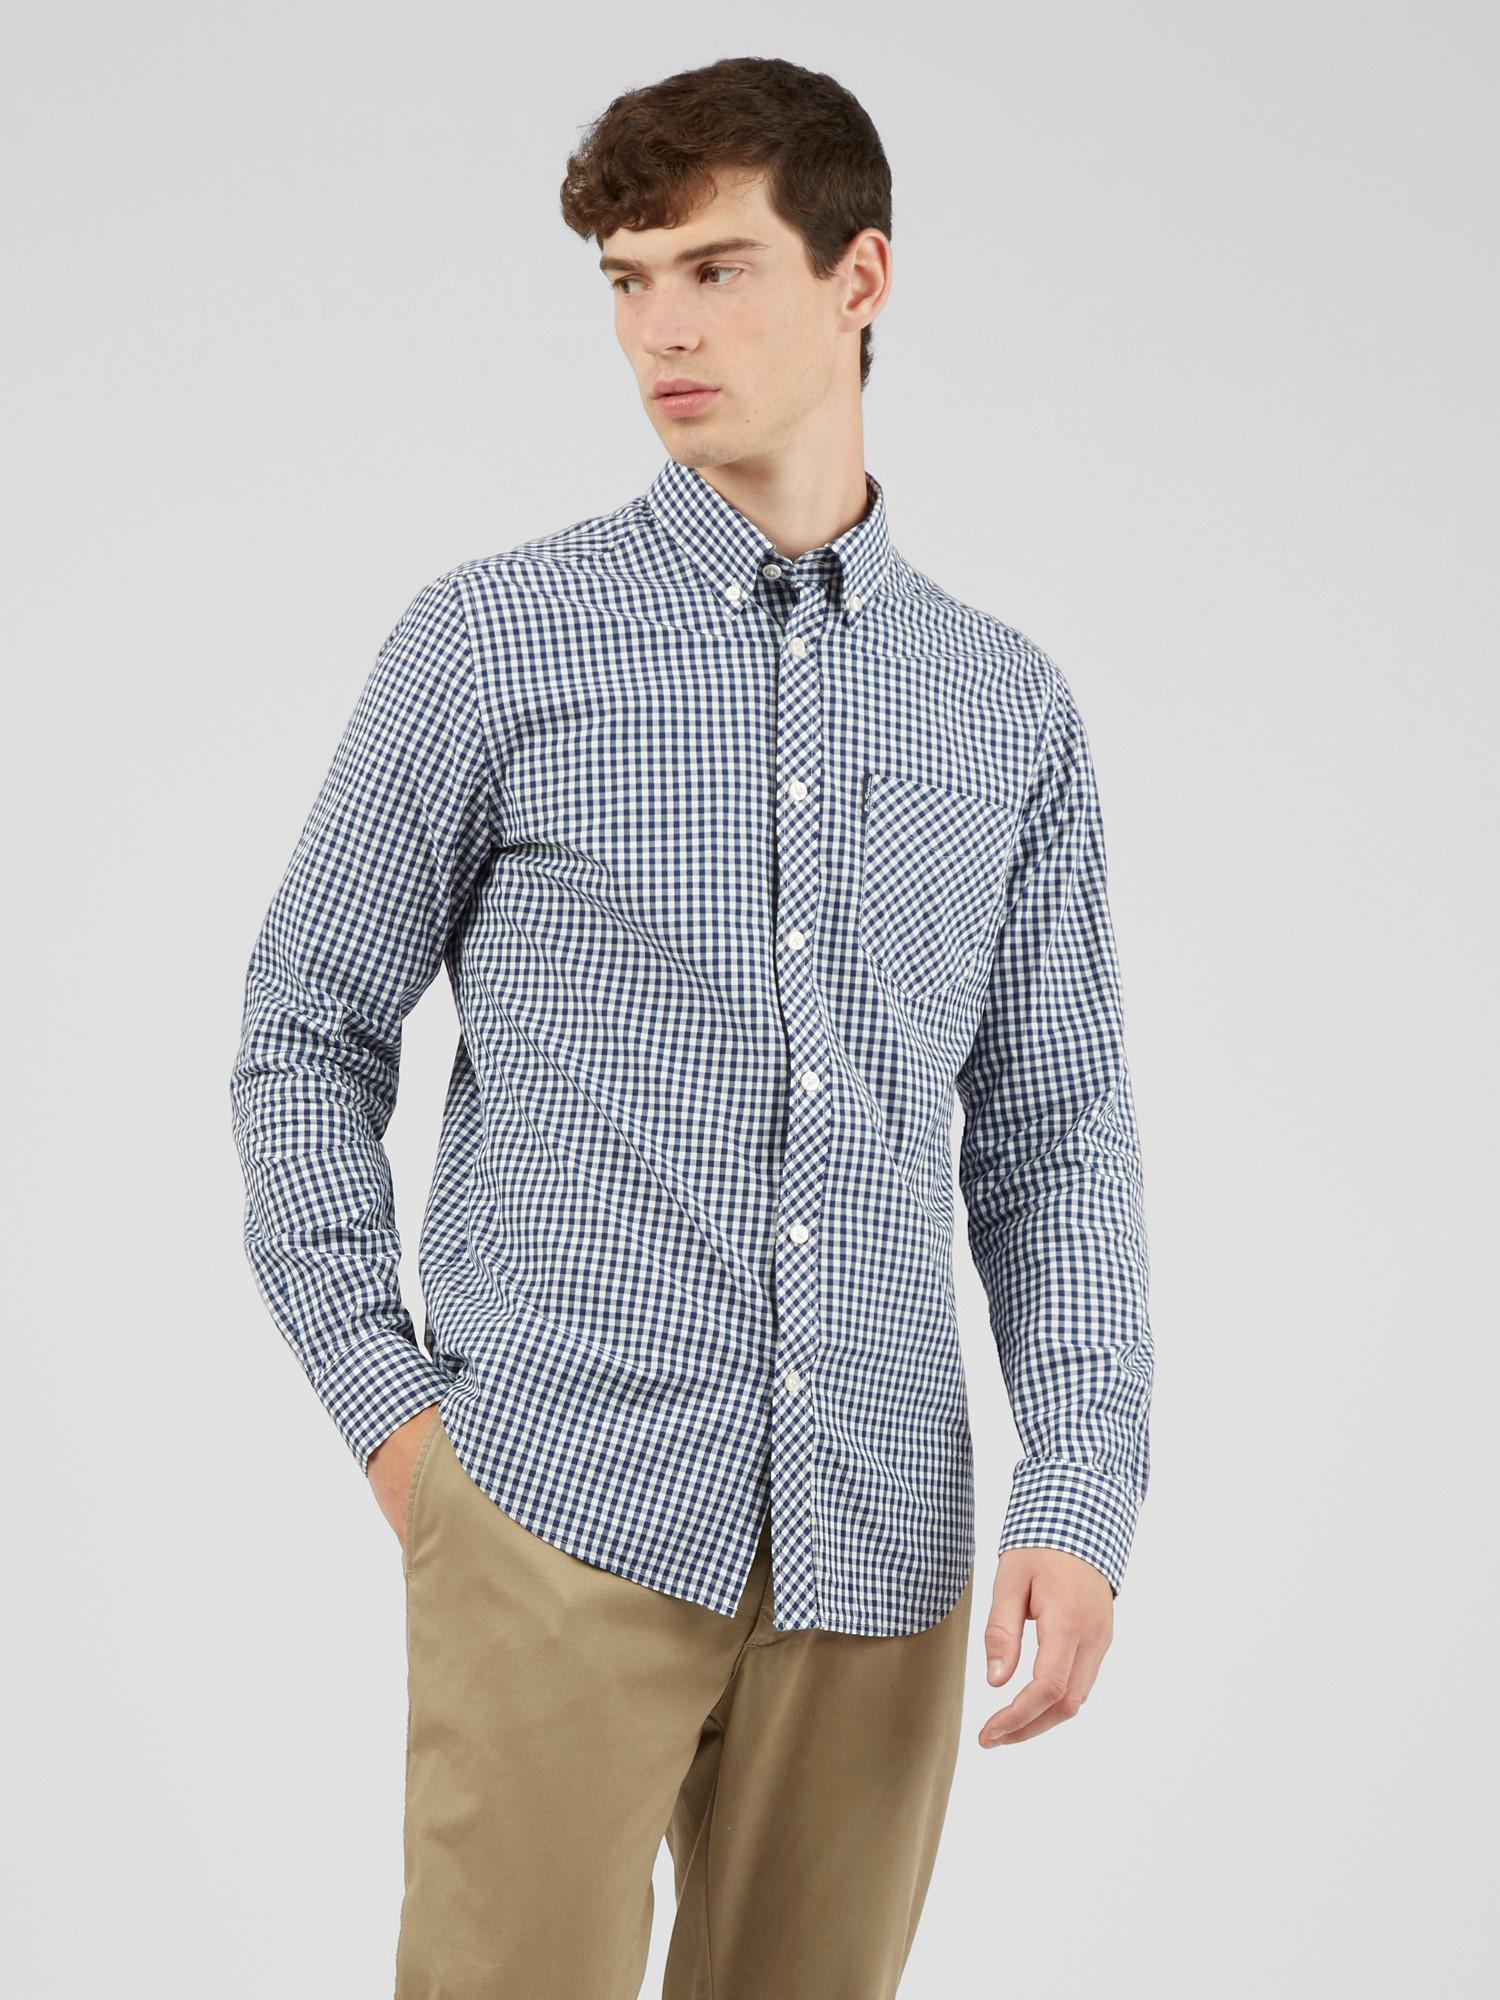 Signature Blue & White Mod Fit Gingham Shirt